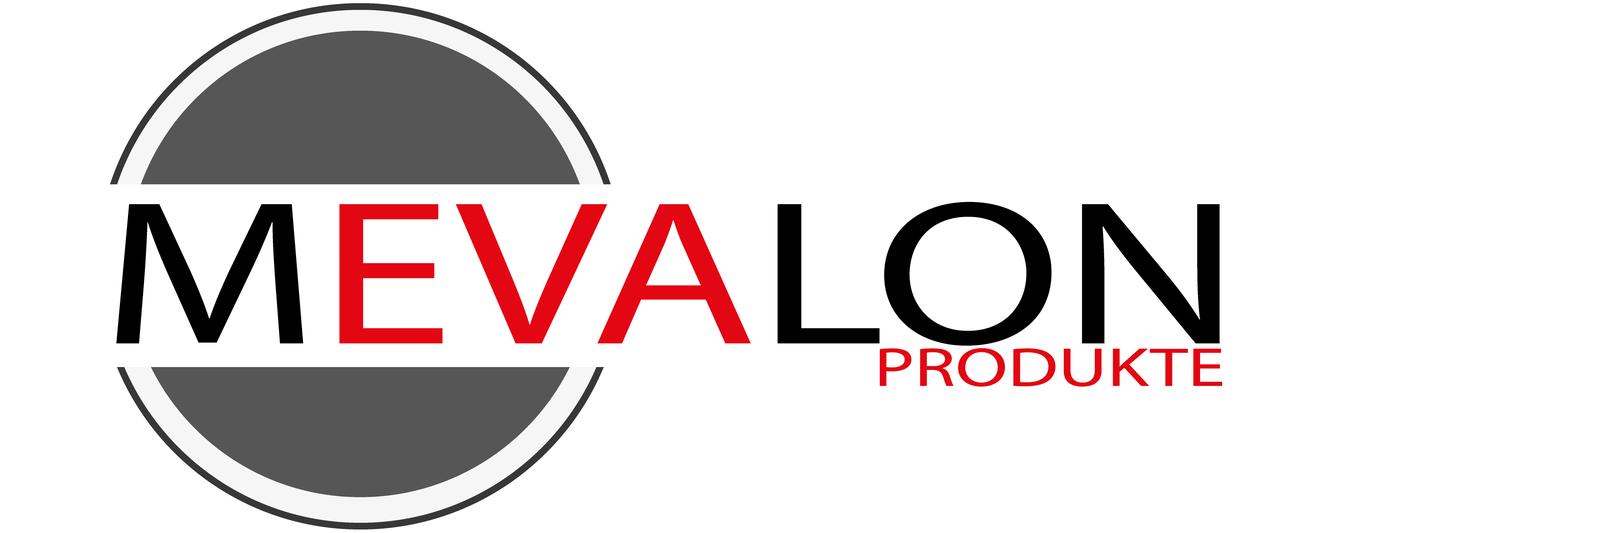 mevalon-produkte